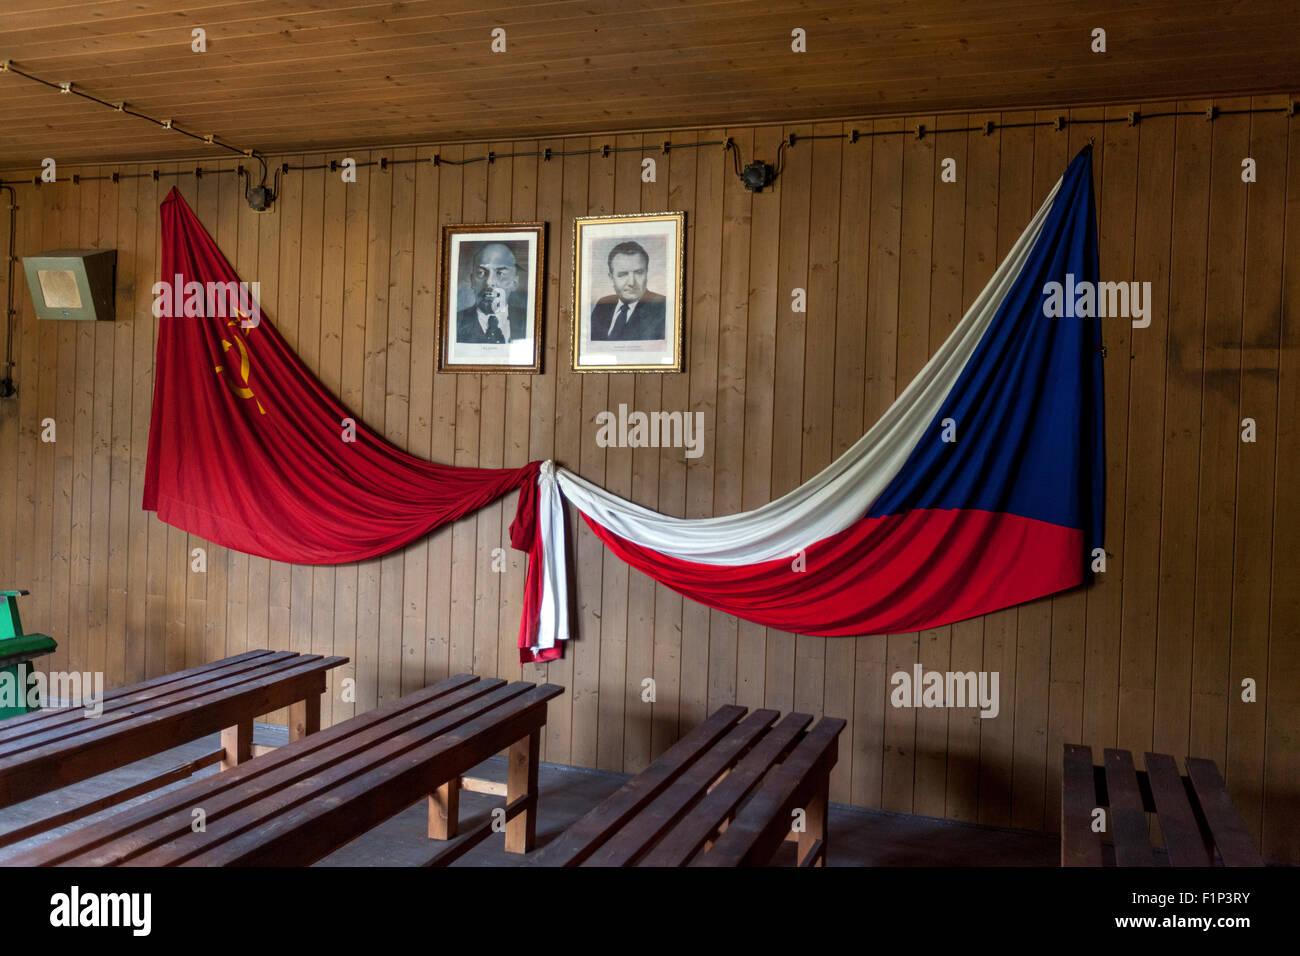 Soviet and Czechoslovak flags, Vojna Memorial, a museum of victims of communism, near Pribram, Czech Republic, Europe - Stock Image